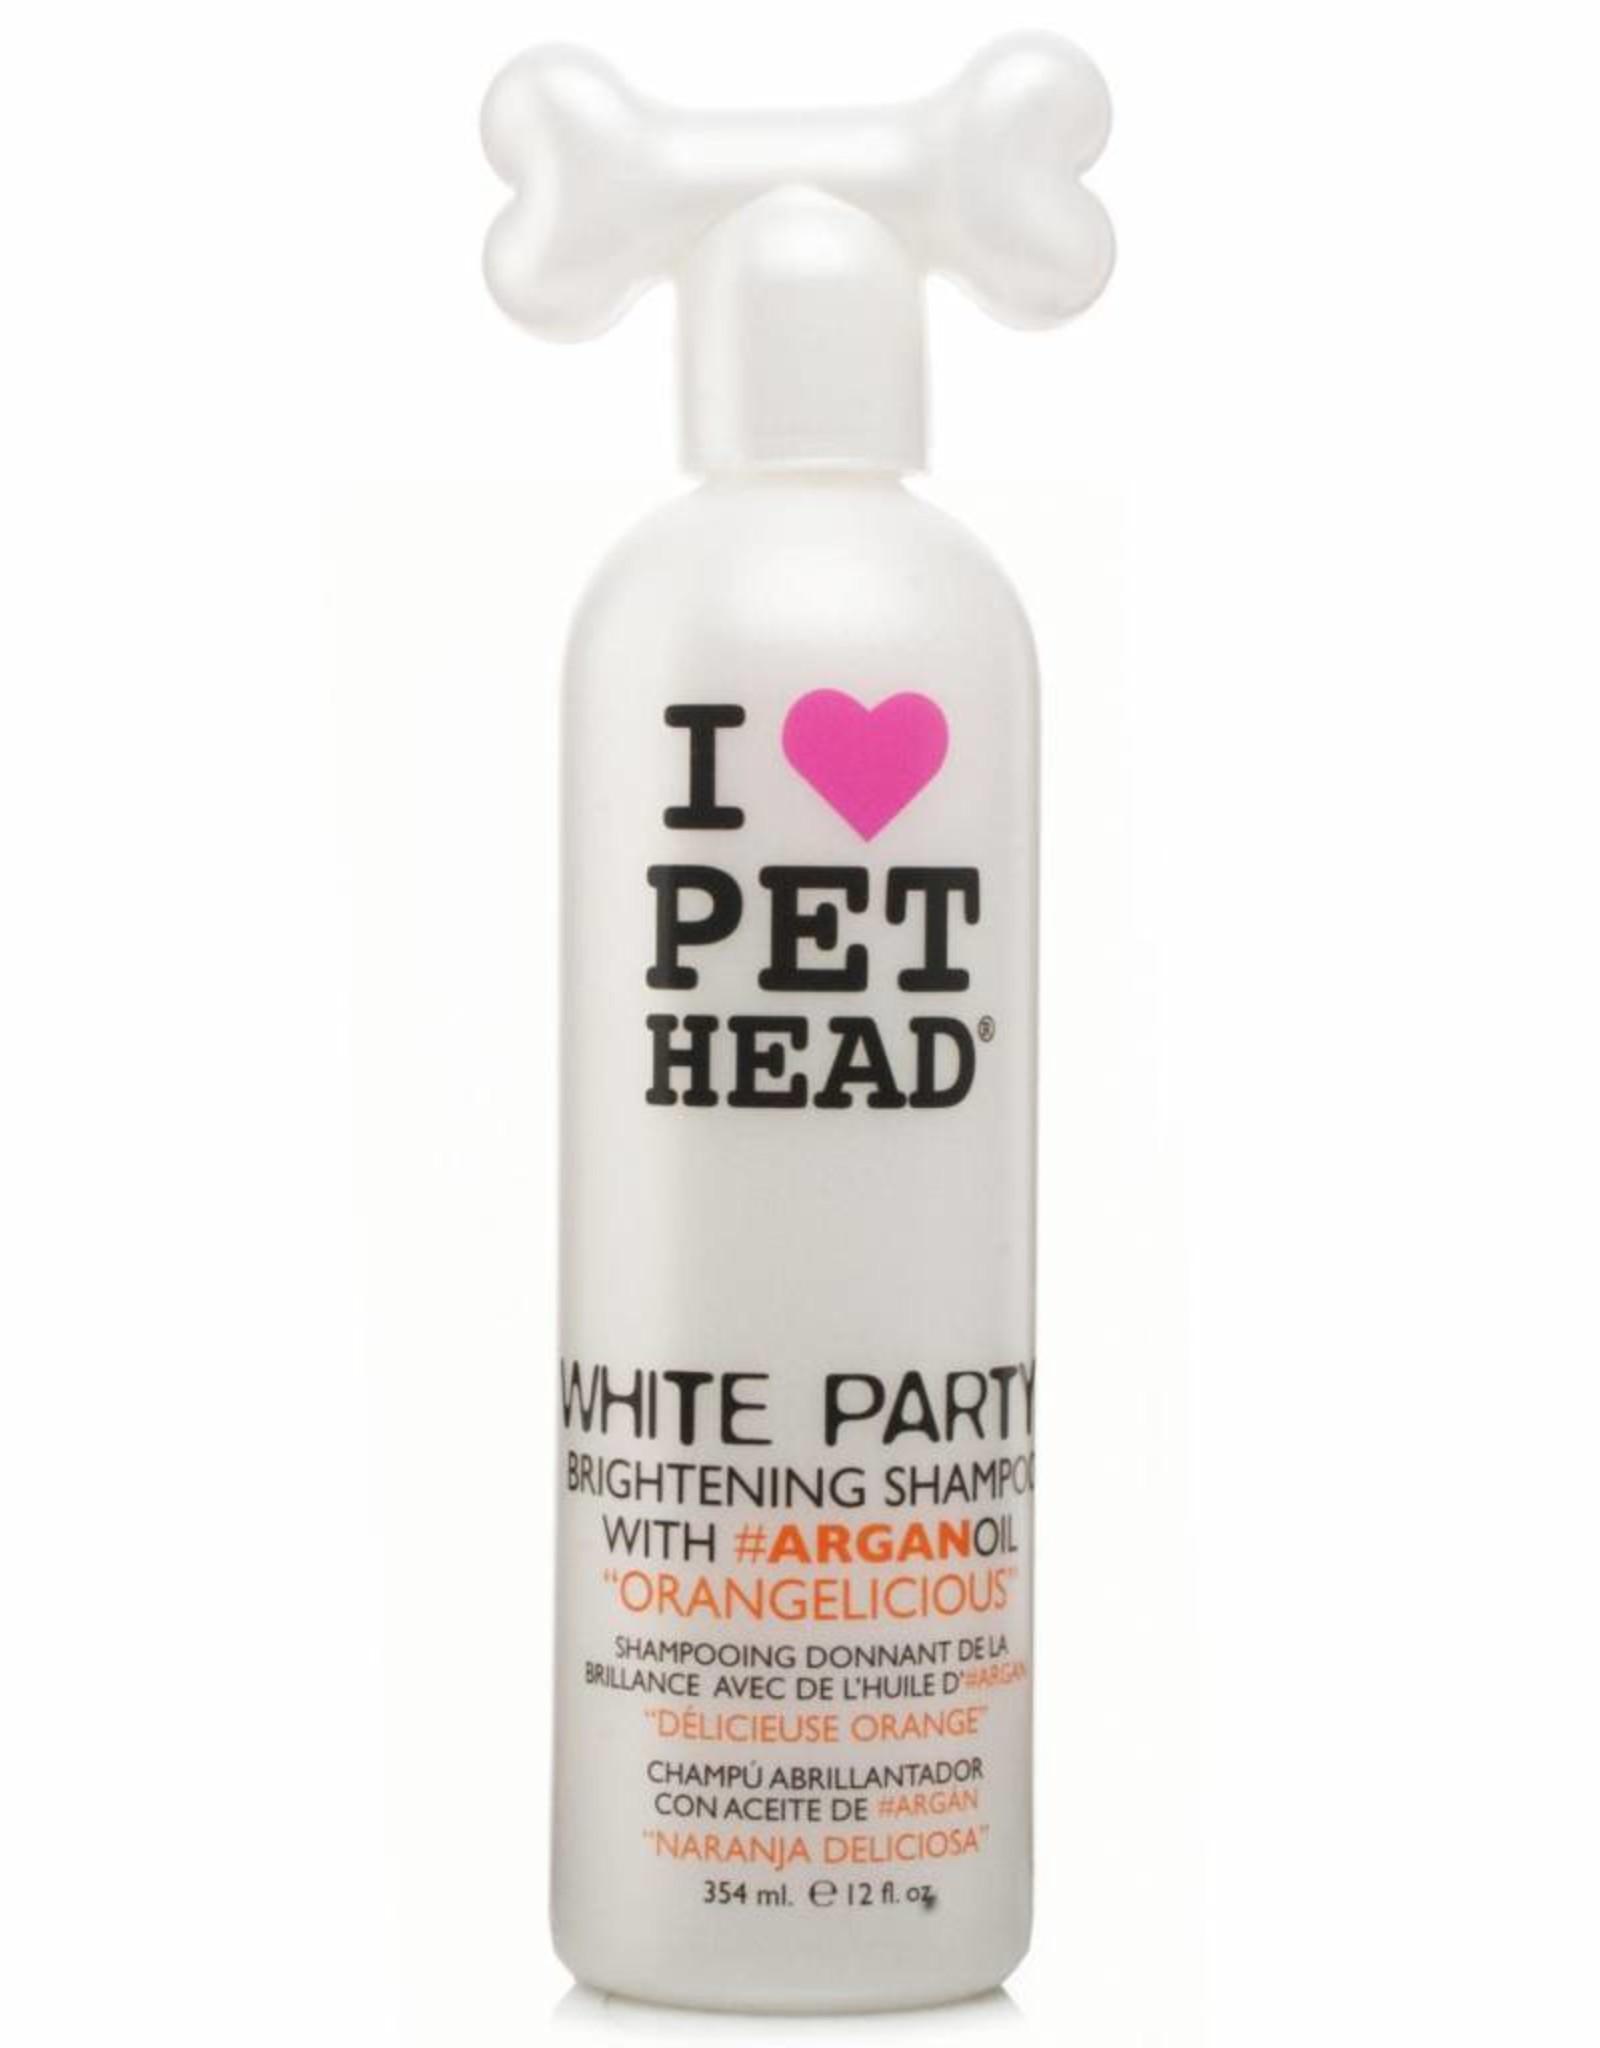 Company of Animals Pet Head White Party Brightening Dog Shampoo 354ml